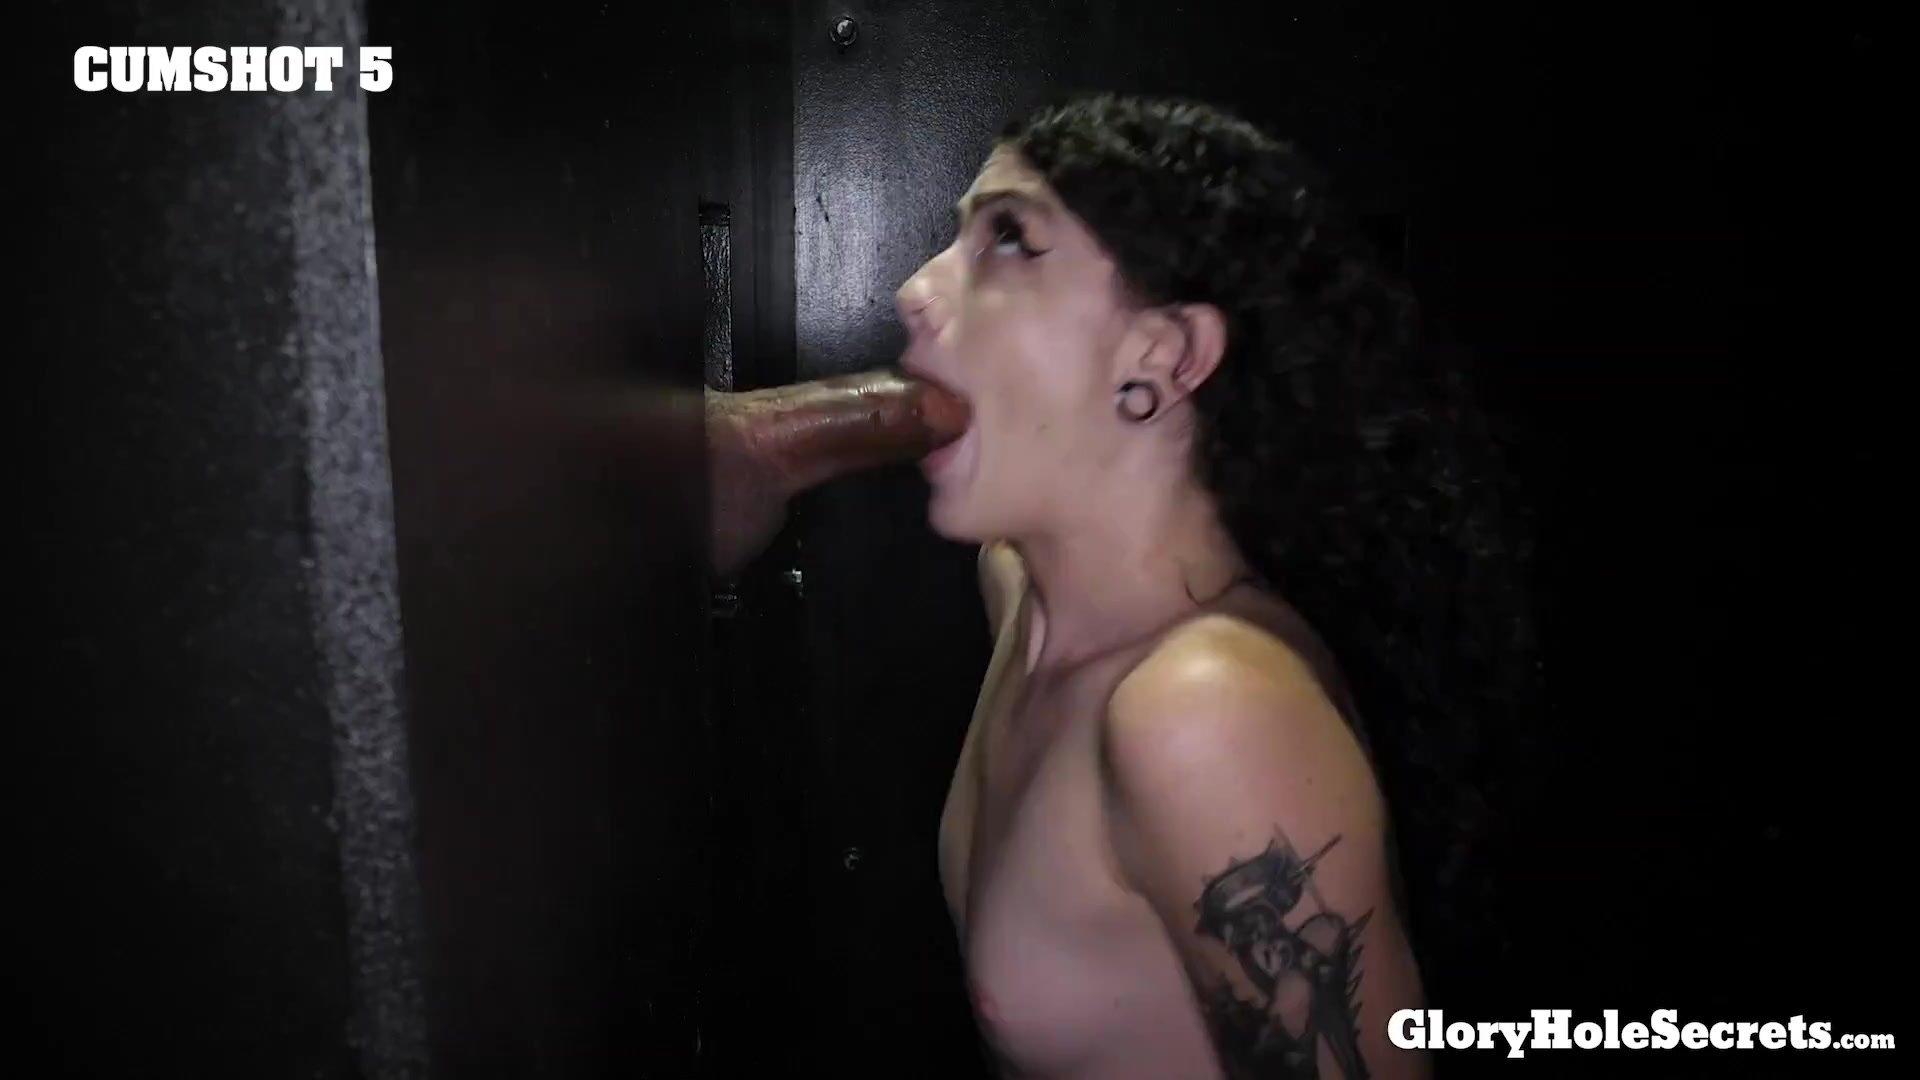 Skinny tattooed Girl sucks dicks in the gloryhole